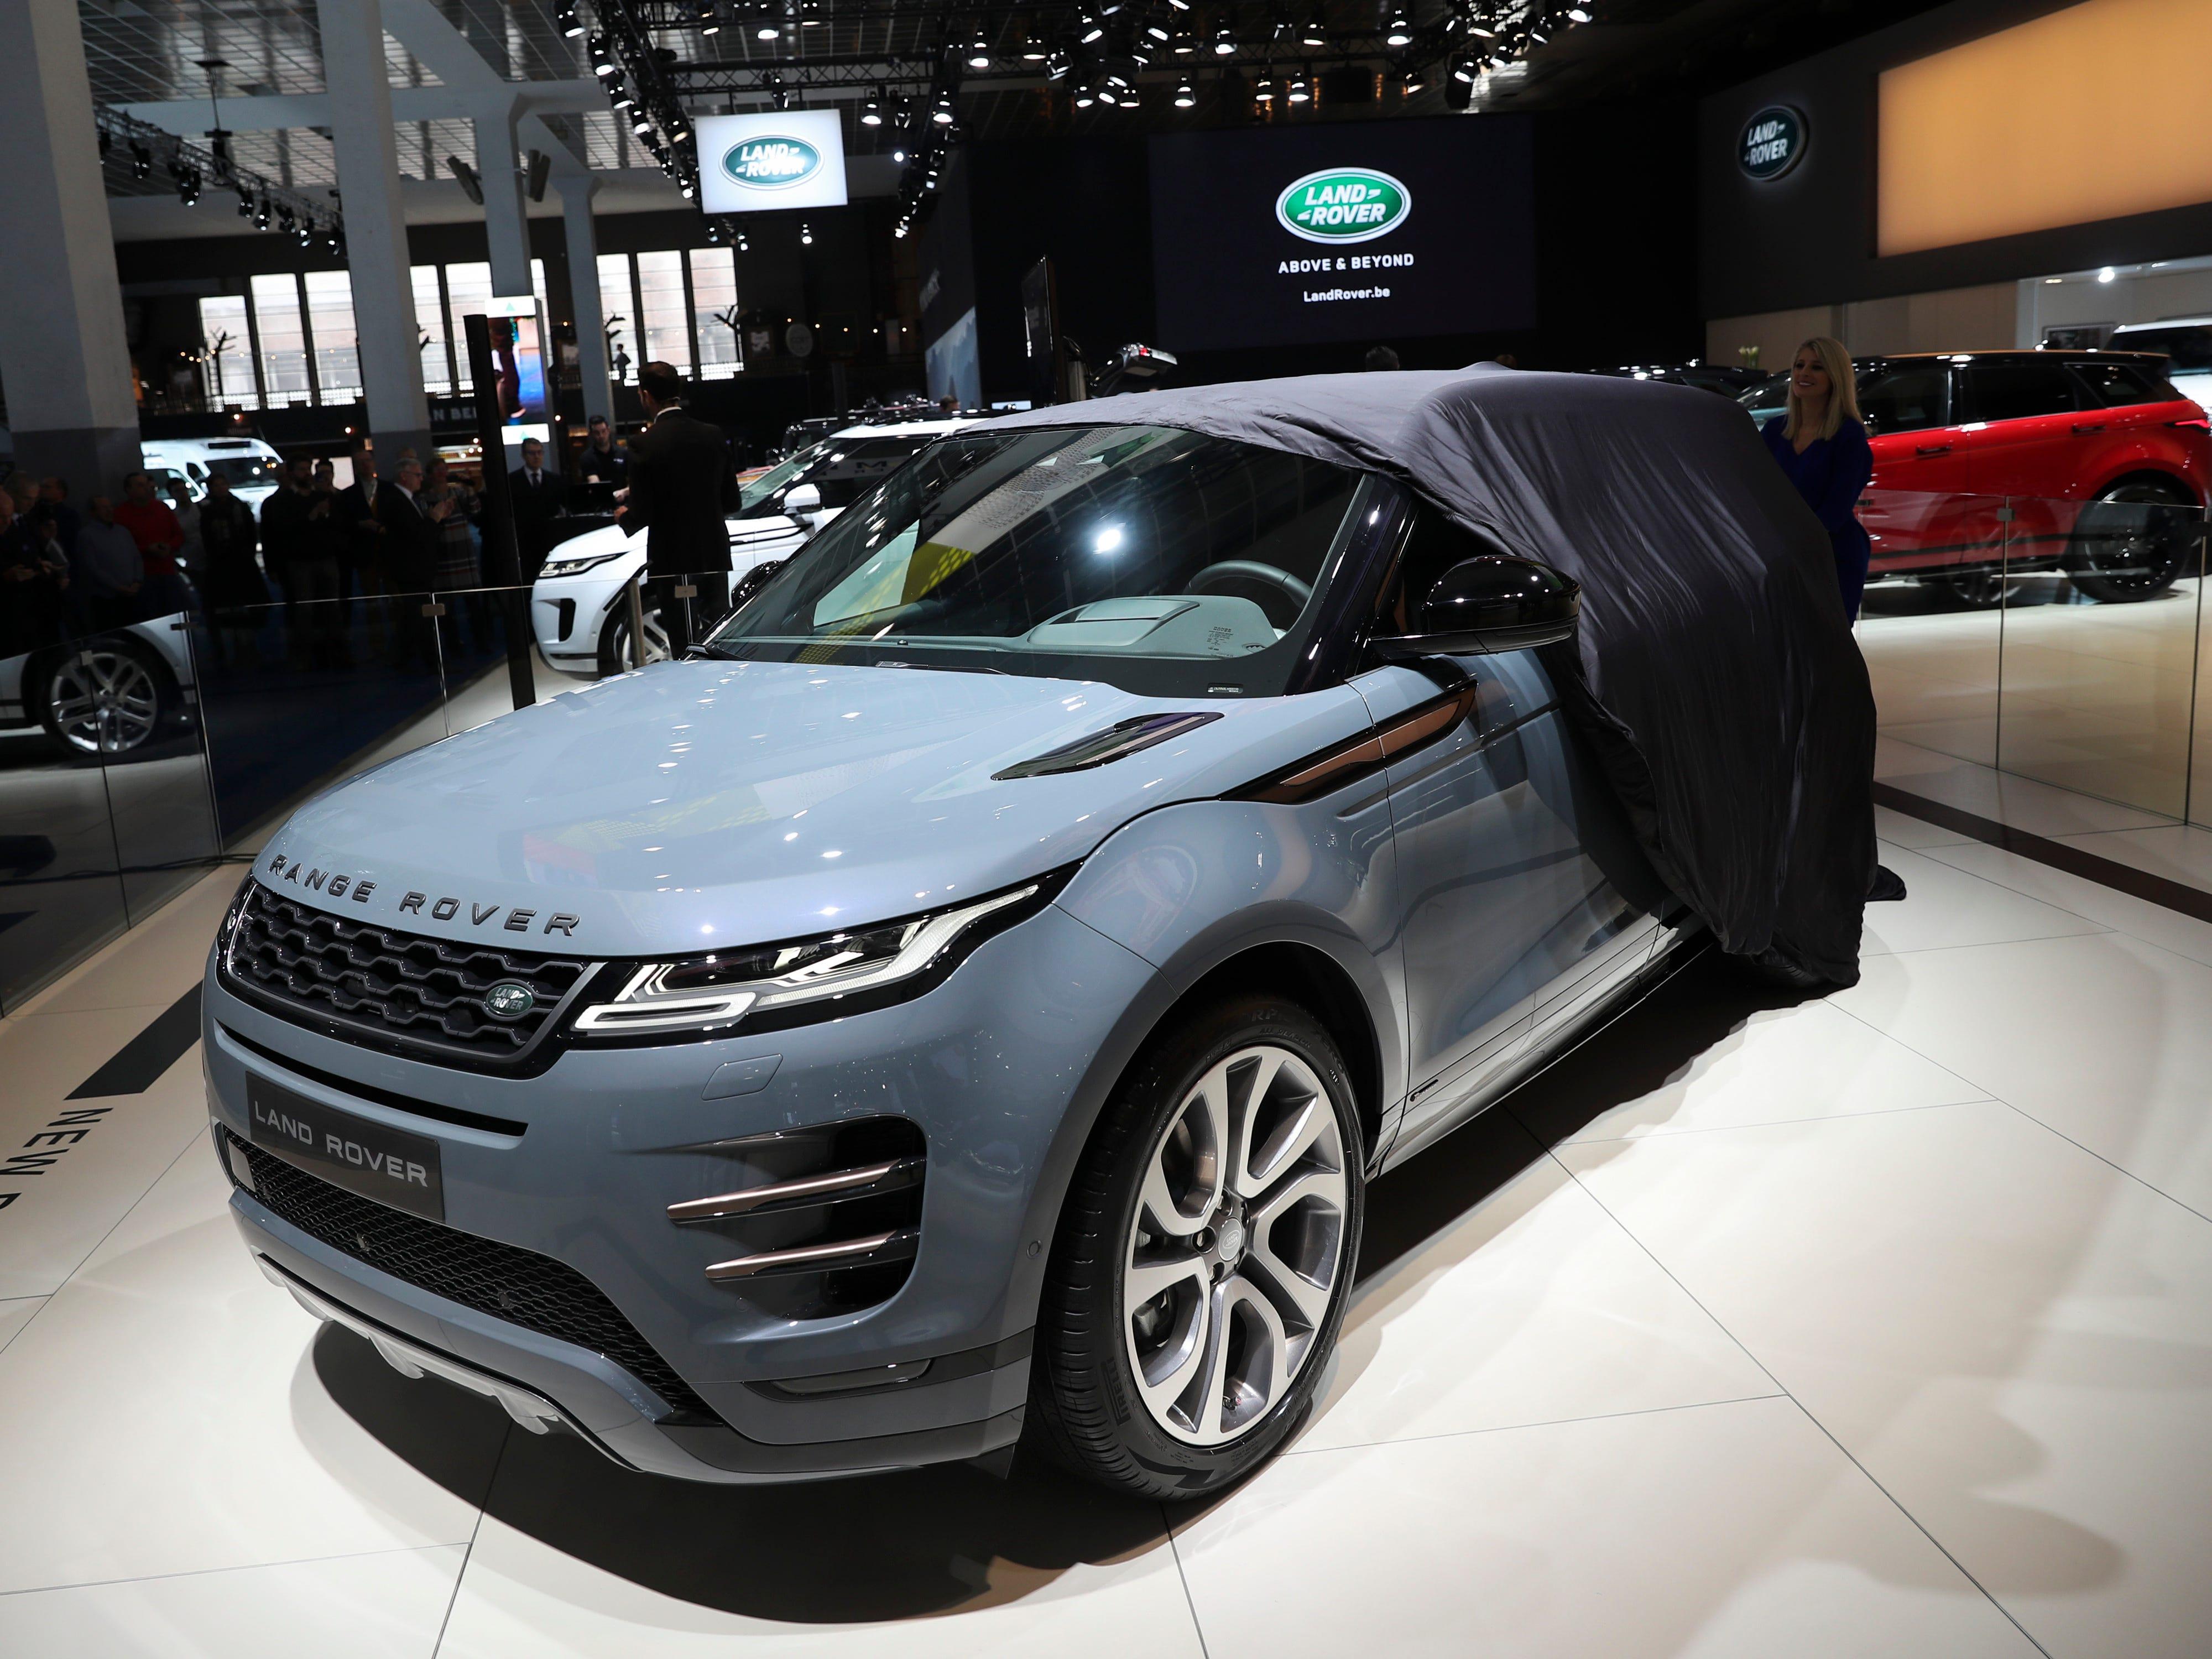 An employee unveils the new Range Rover Evoque.